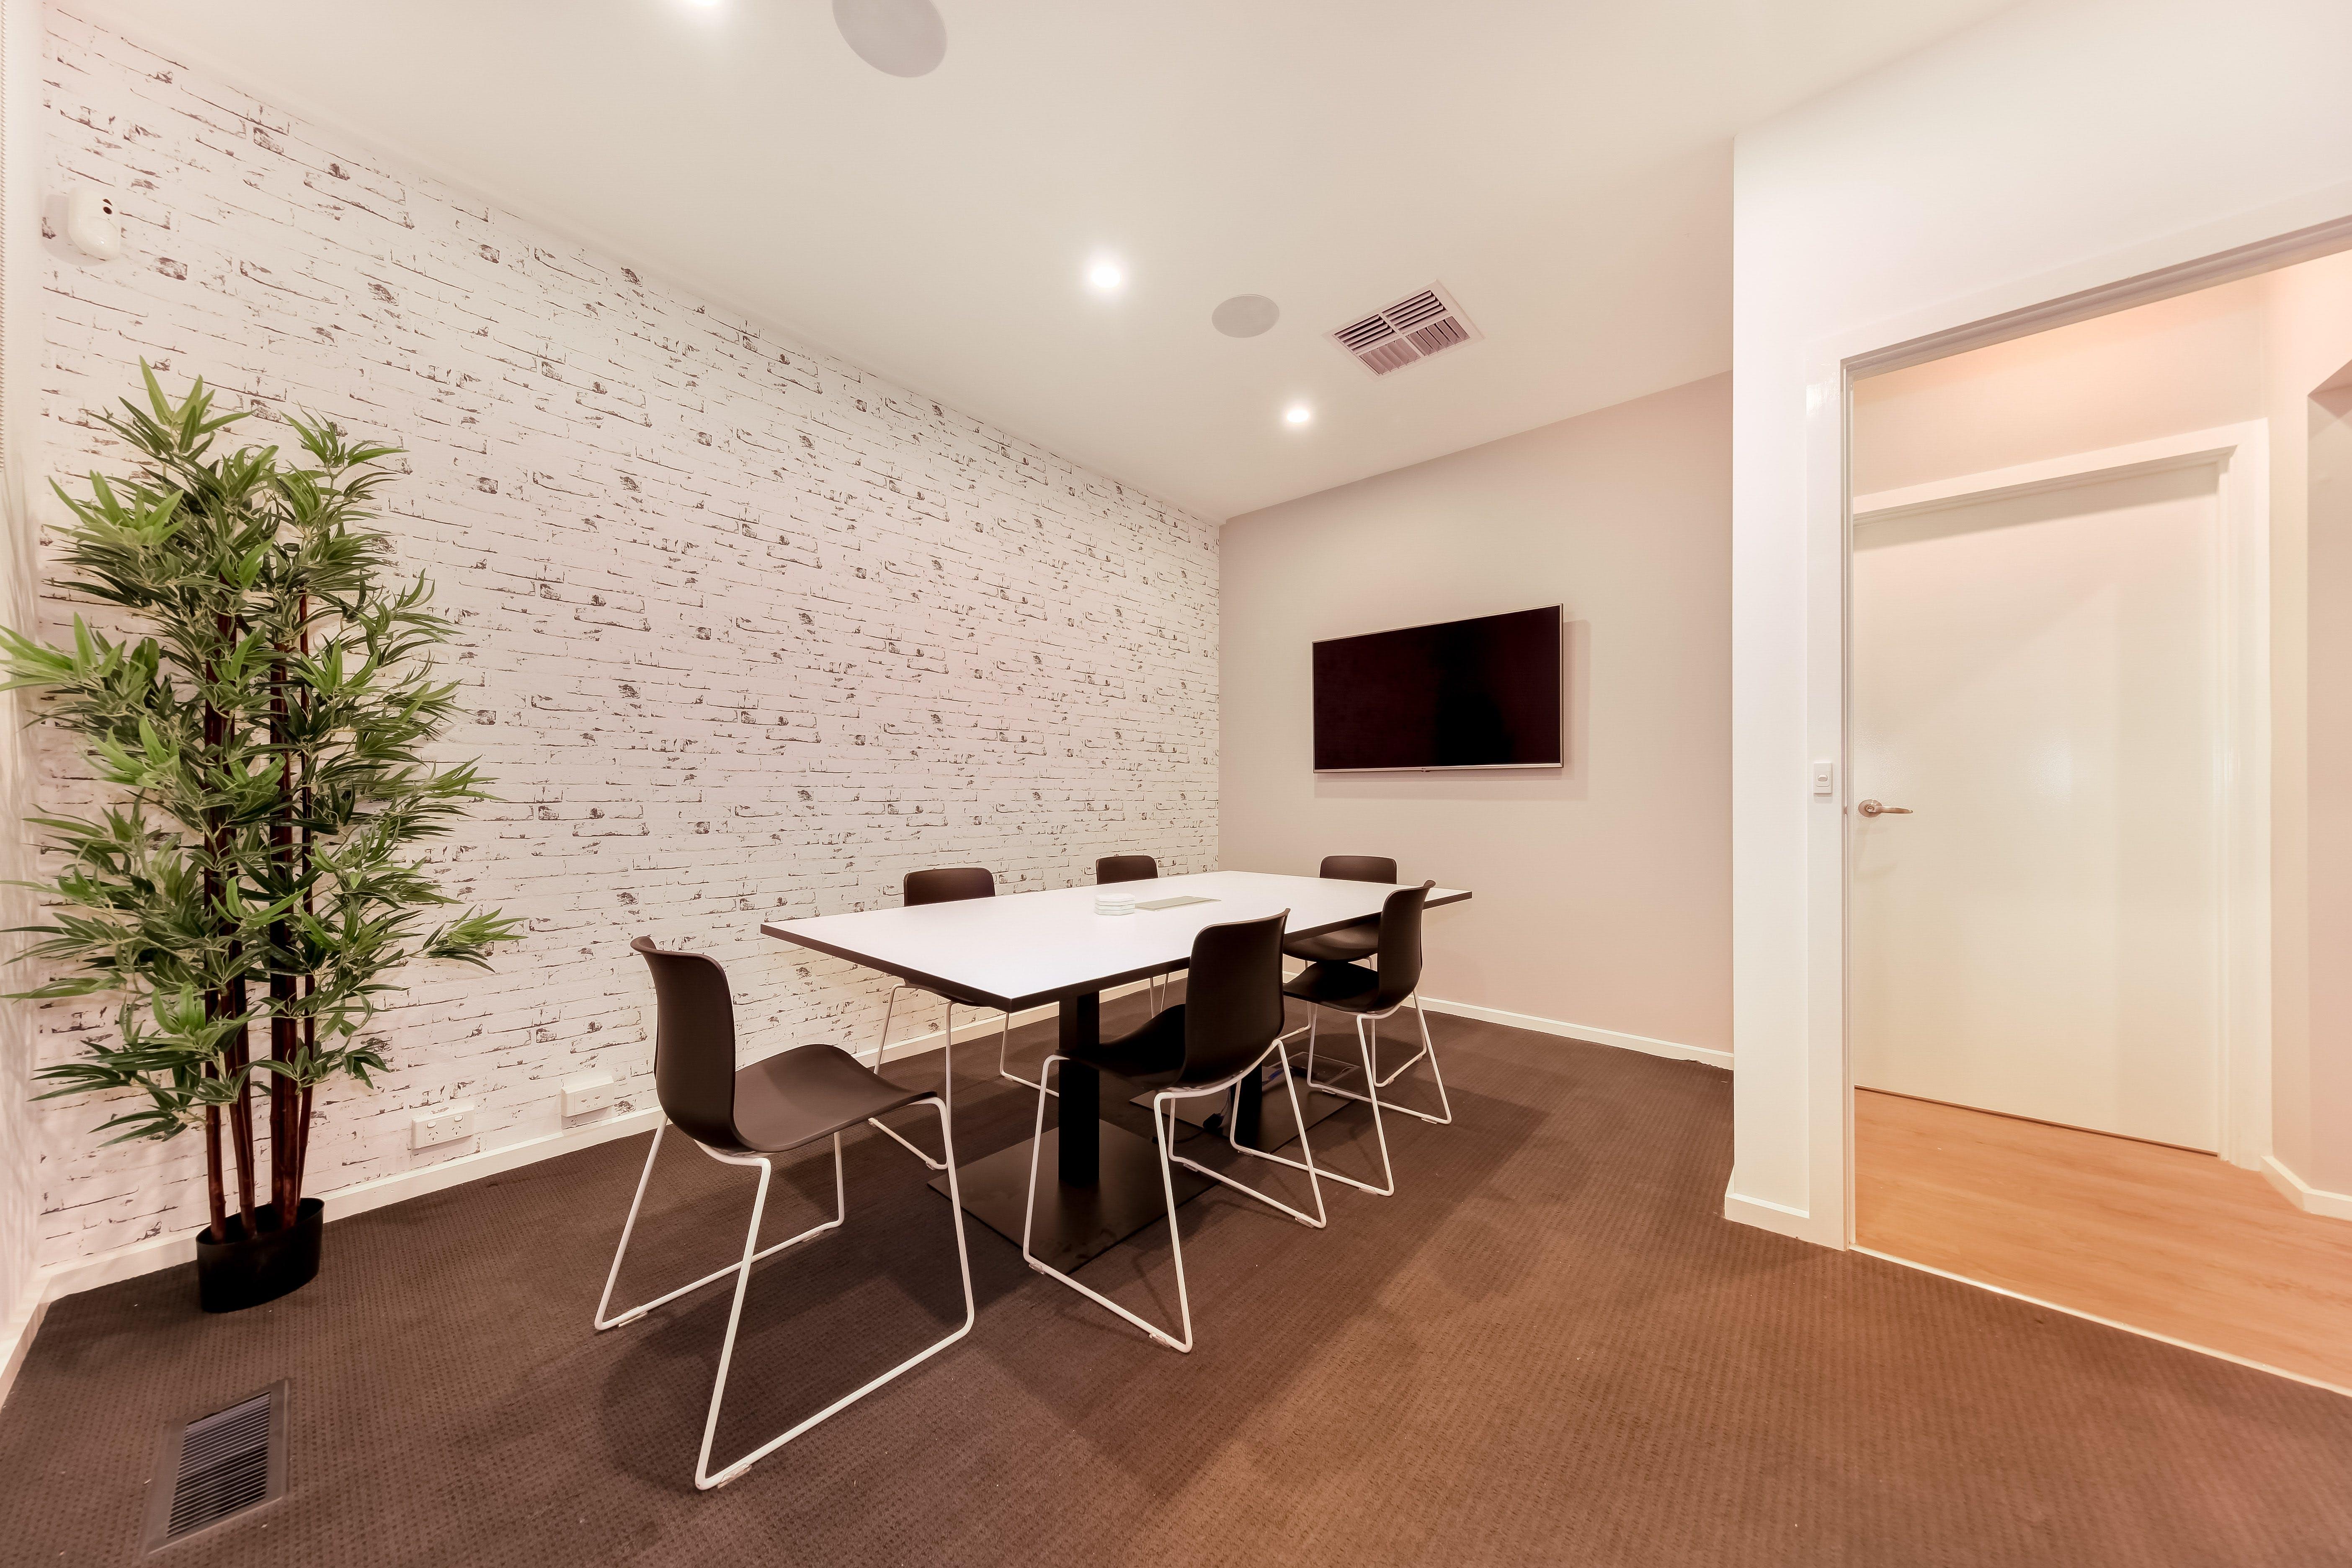 Meeting room at Platinum Accounting, image 1